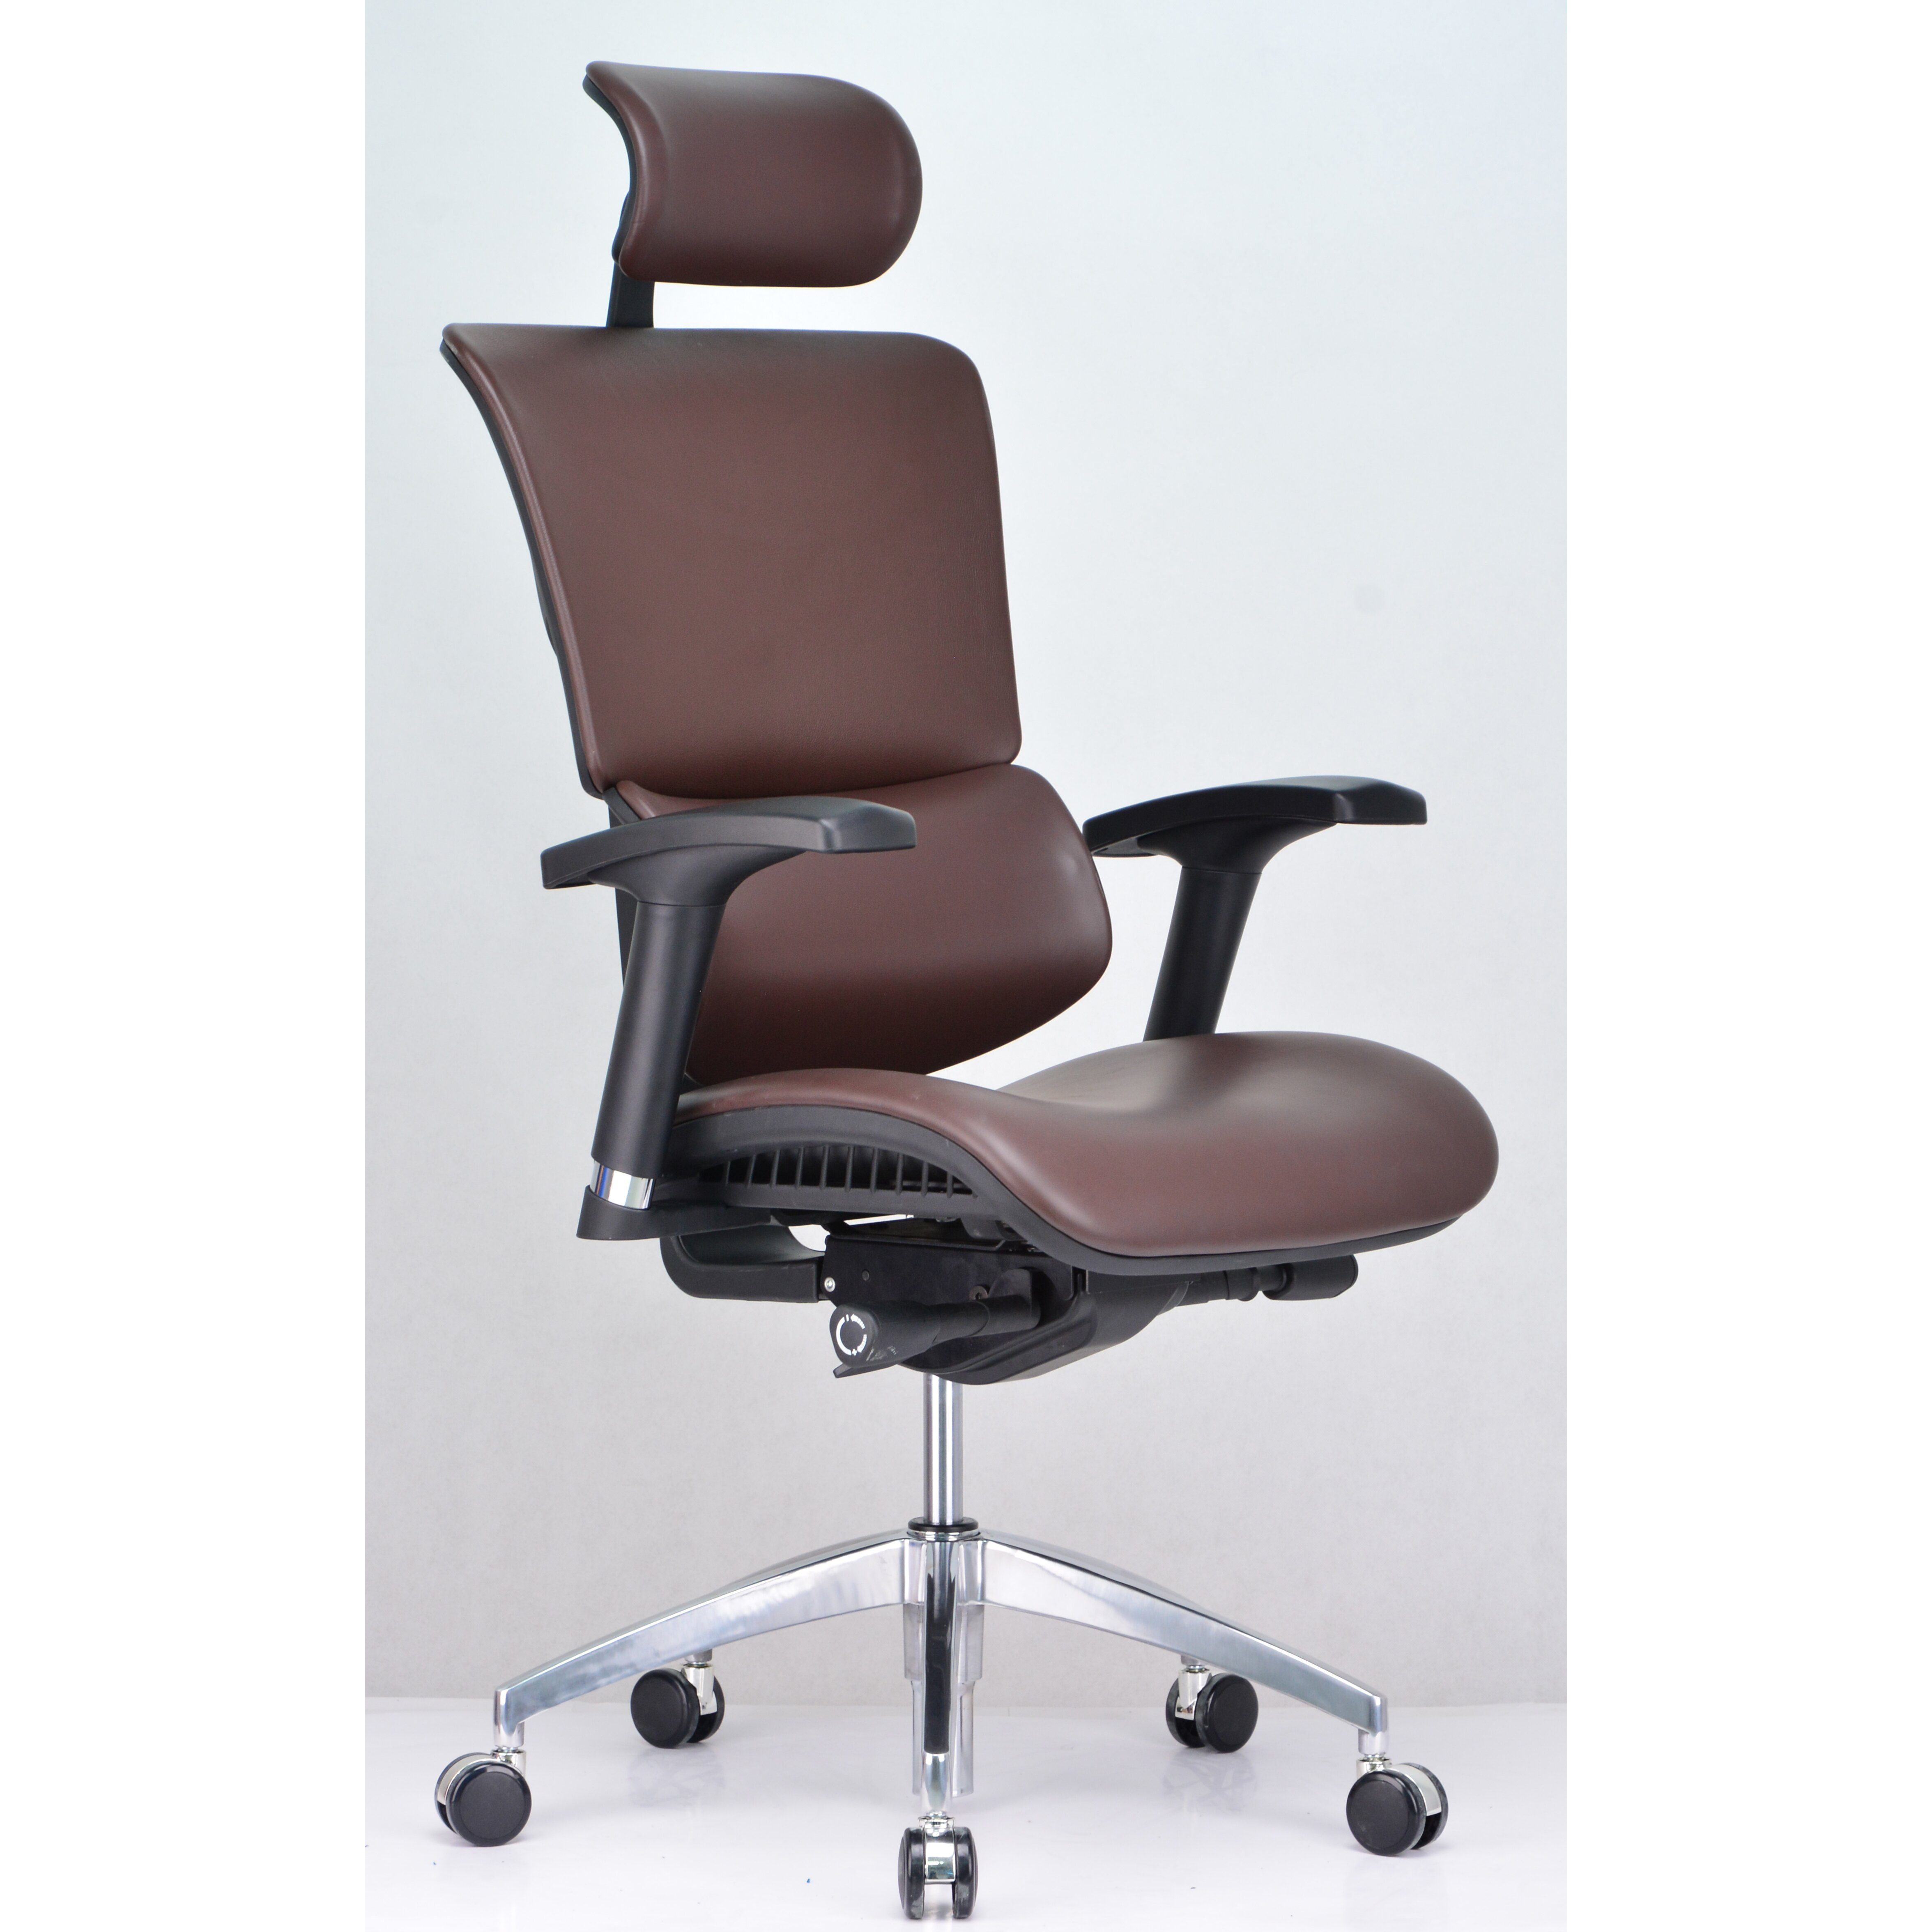 Conklin Office Furniture Vito High Back Leather Executive